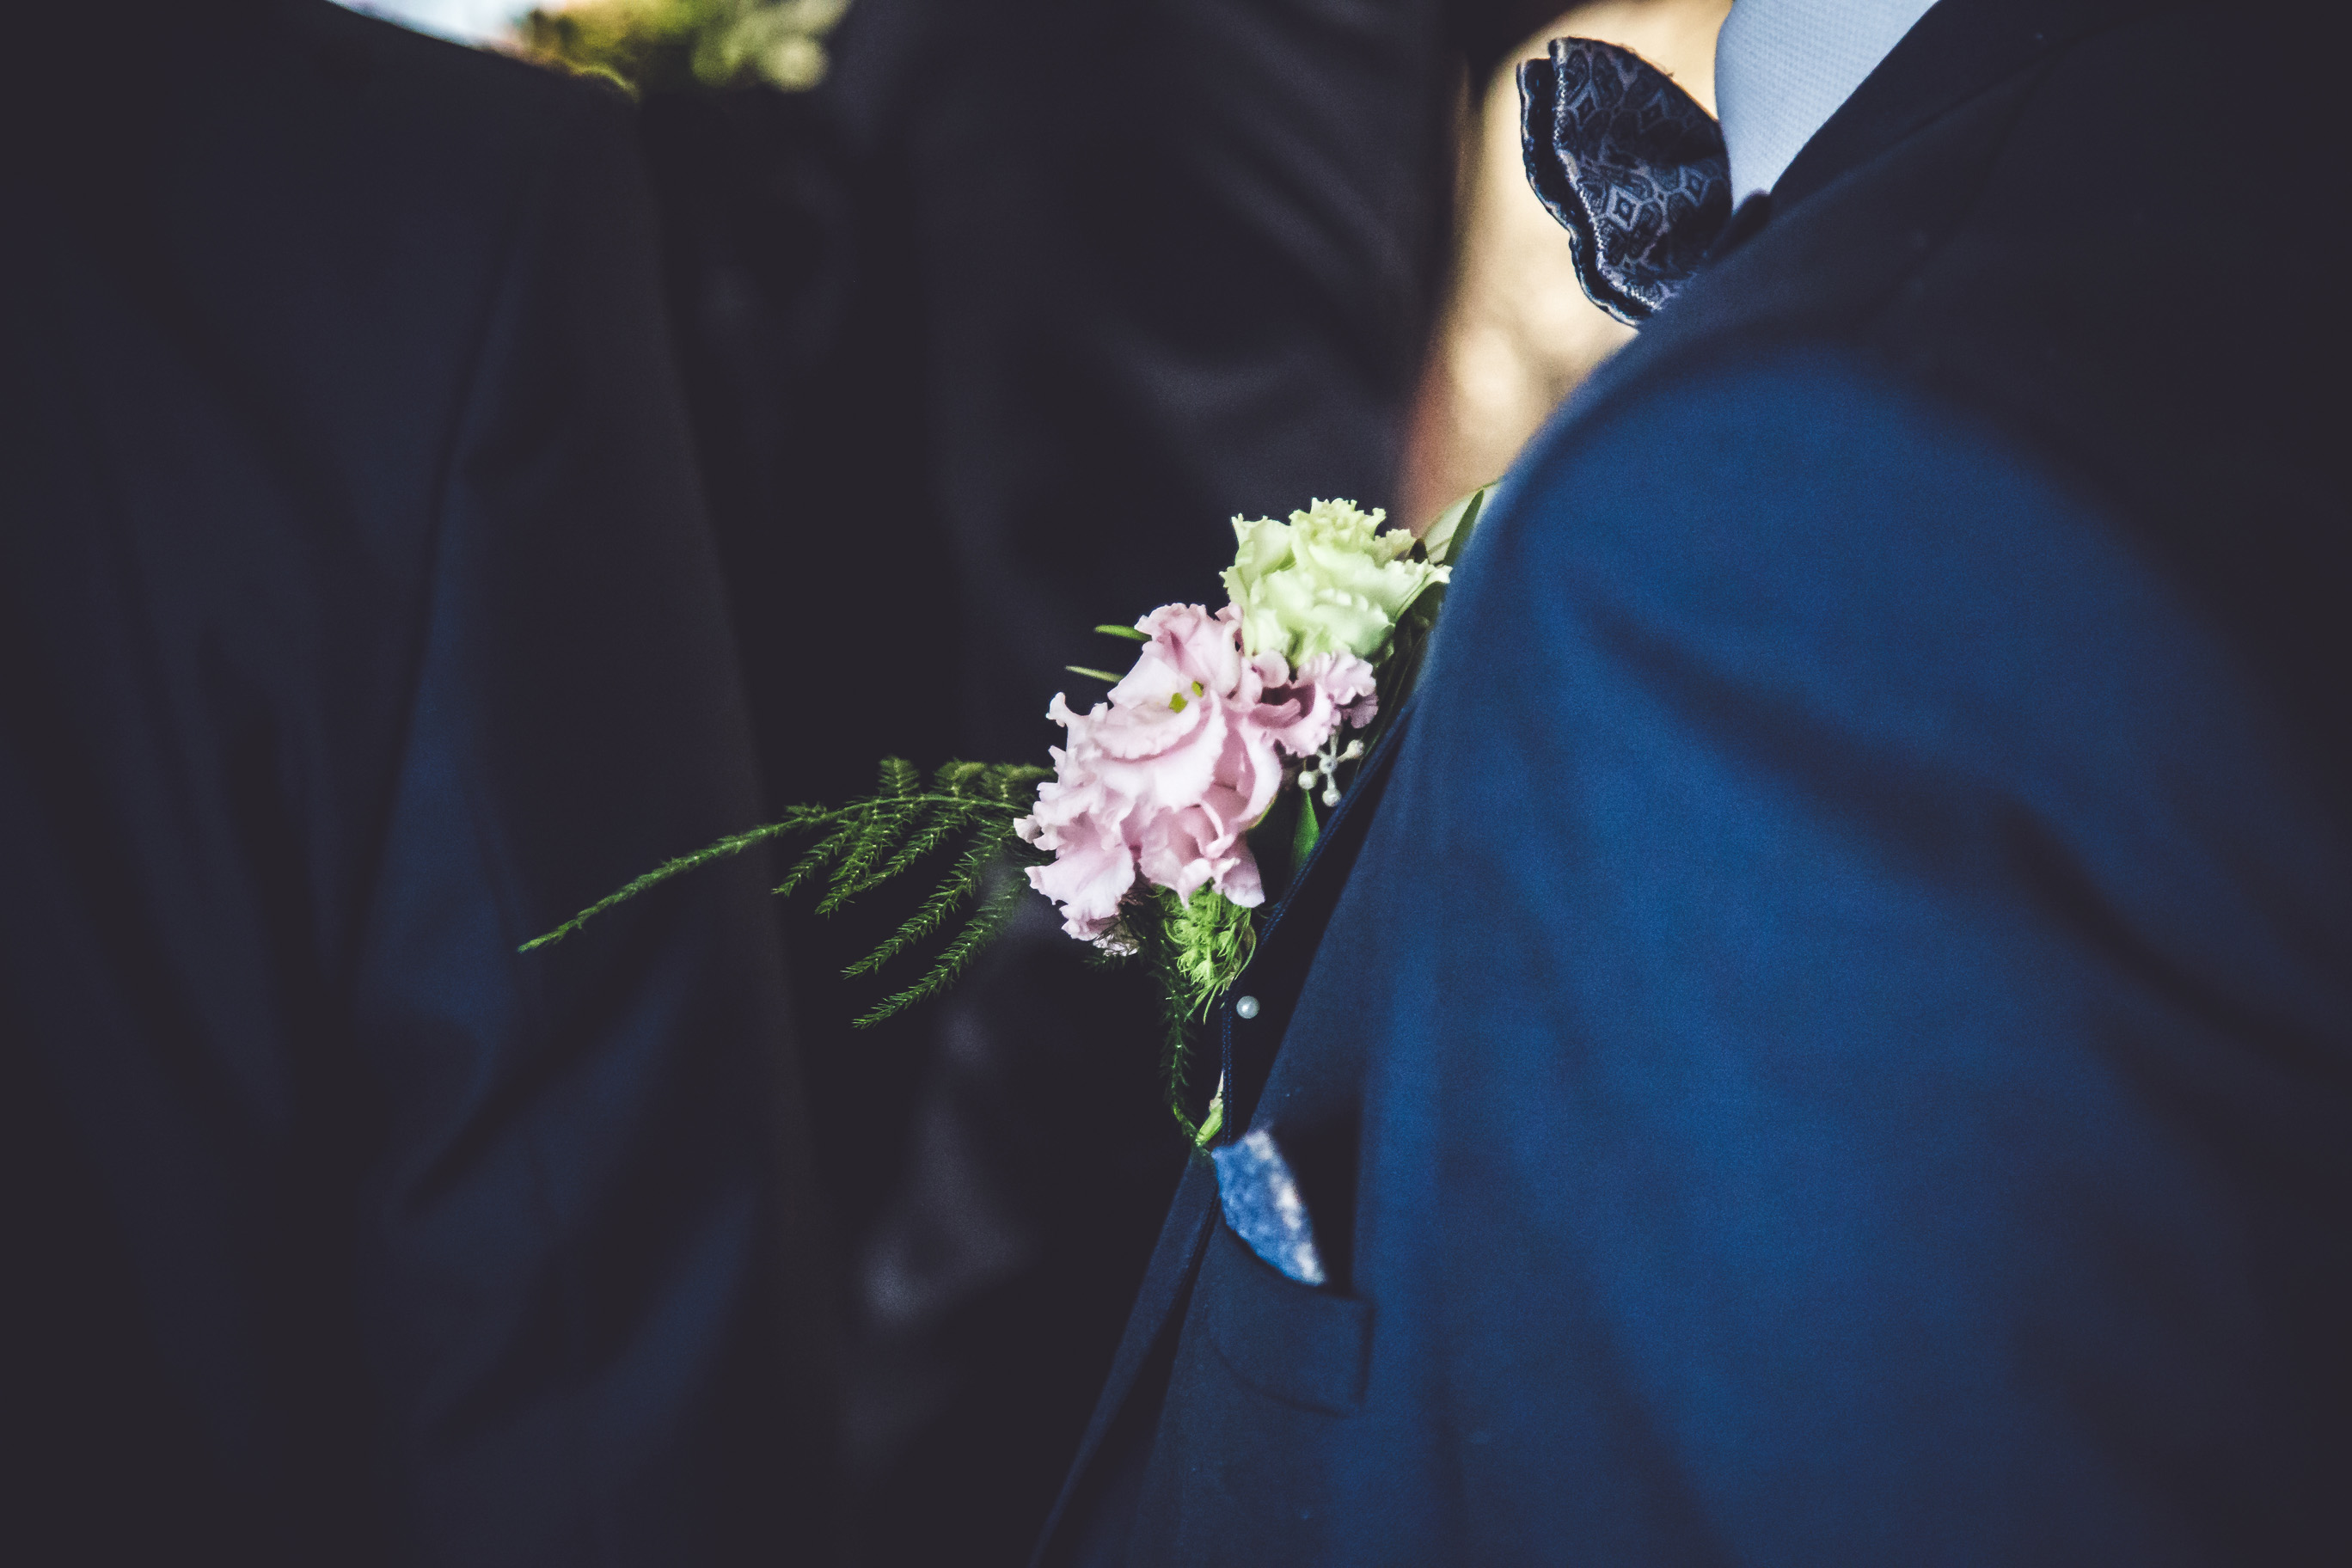 groom at the wedding